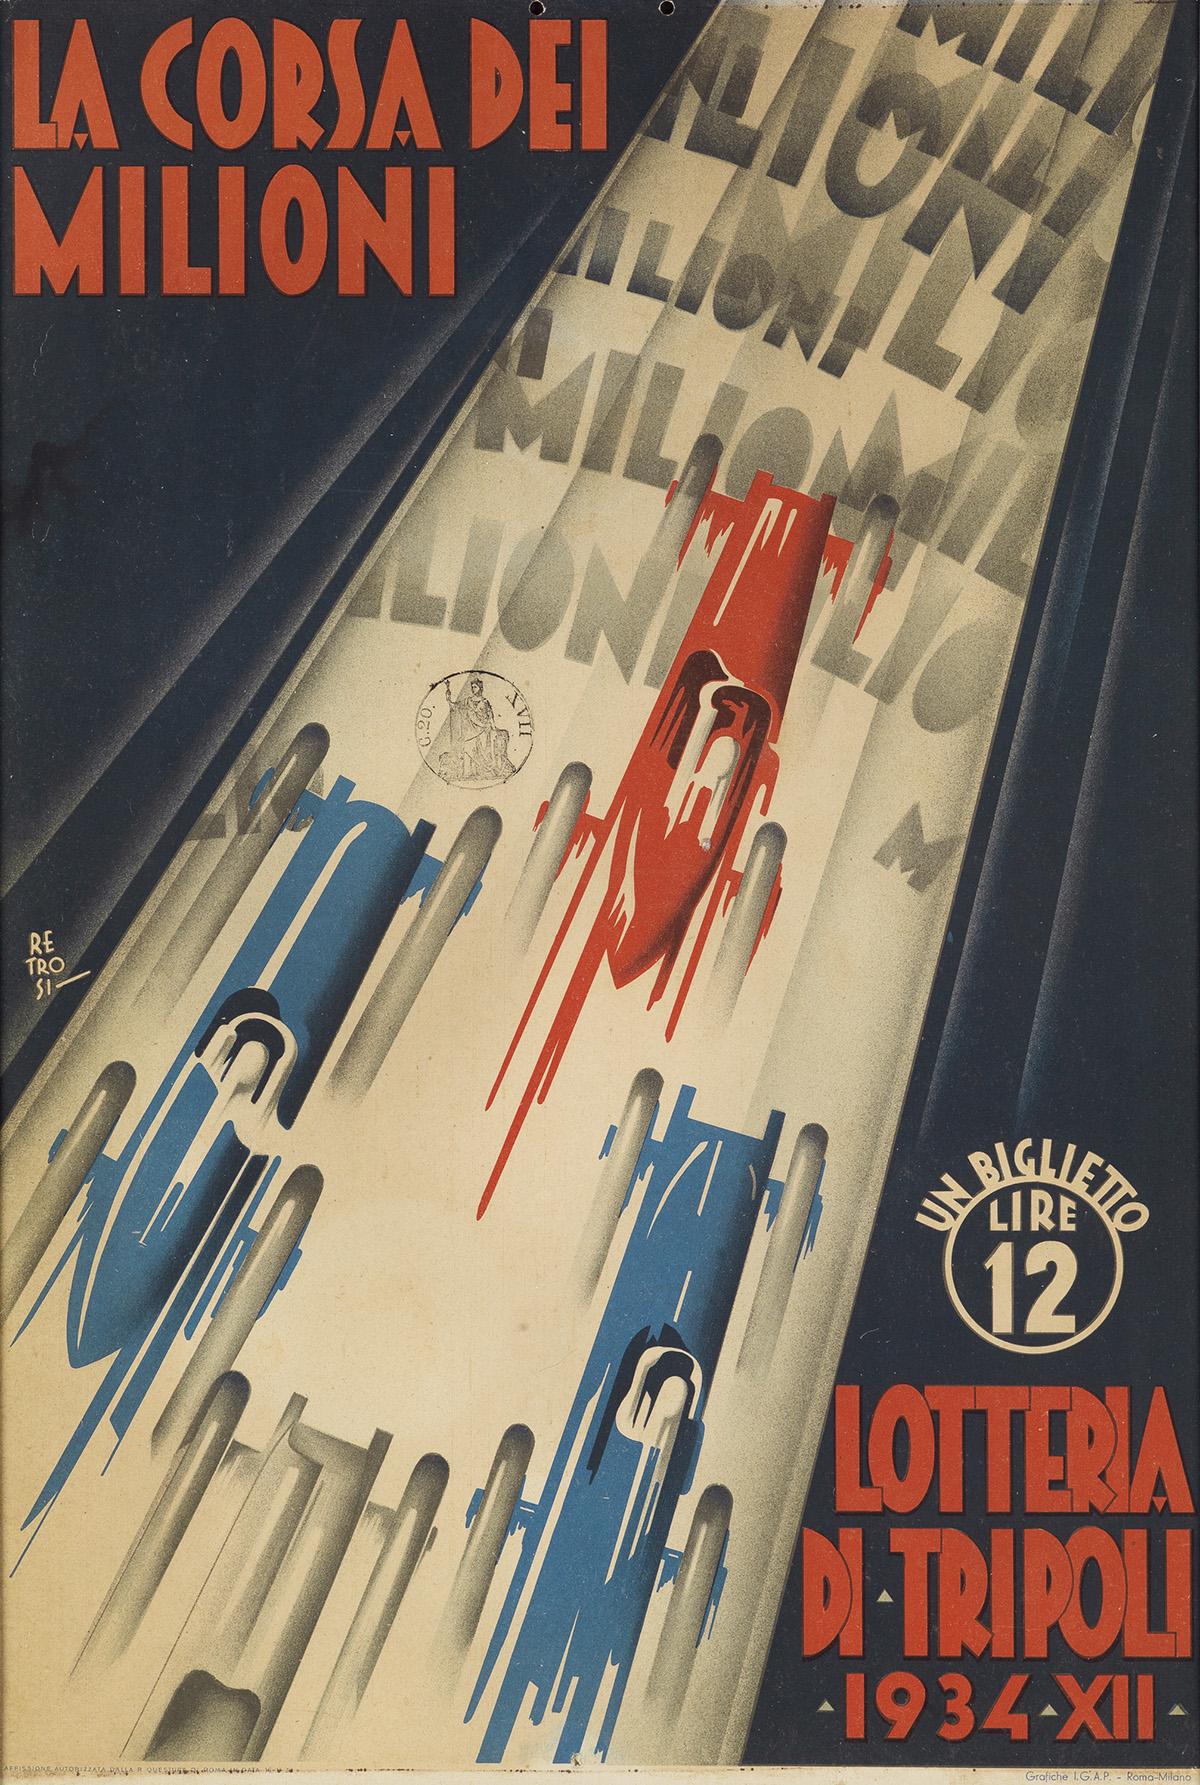 VIRGILIO-RETROSI-(1892-1975)-LA-CORSA-DEI-MILIONI--LOTTERIA-